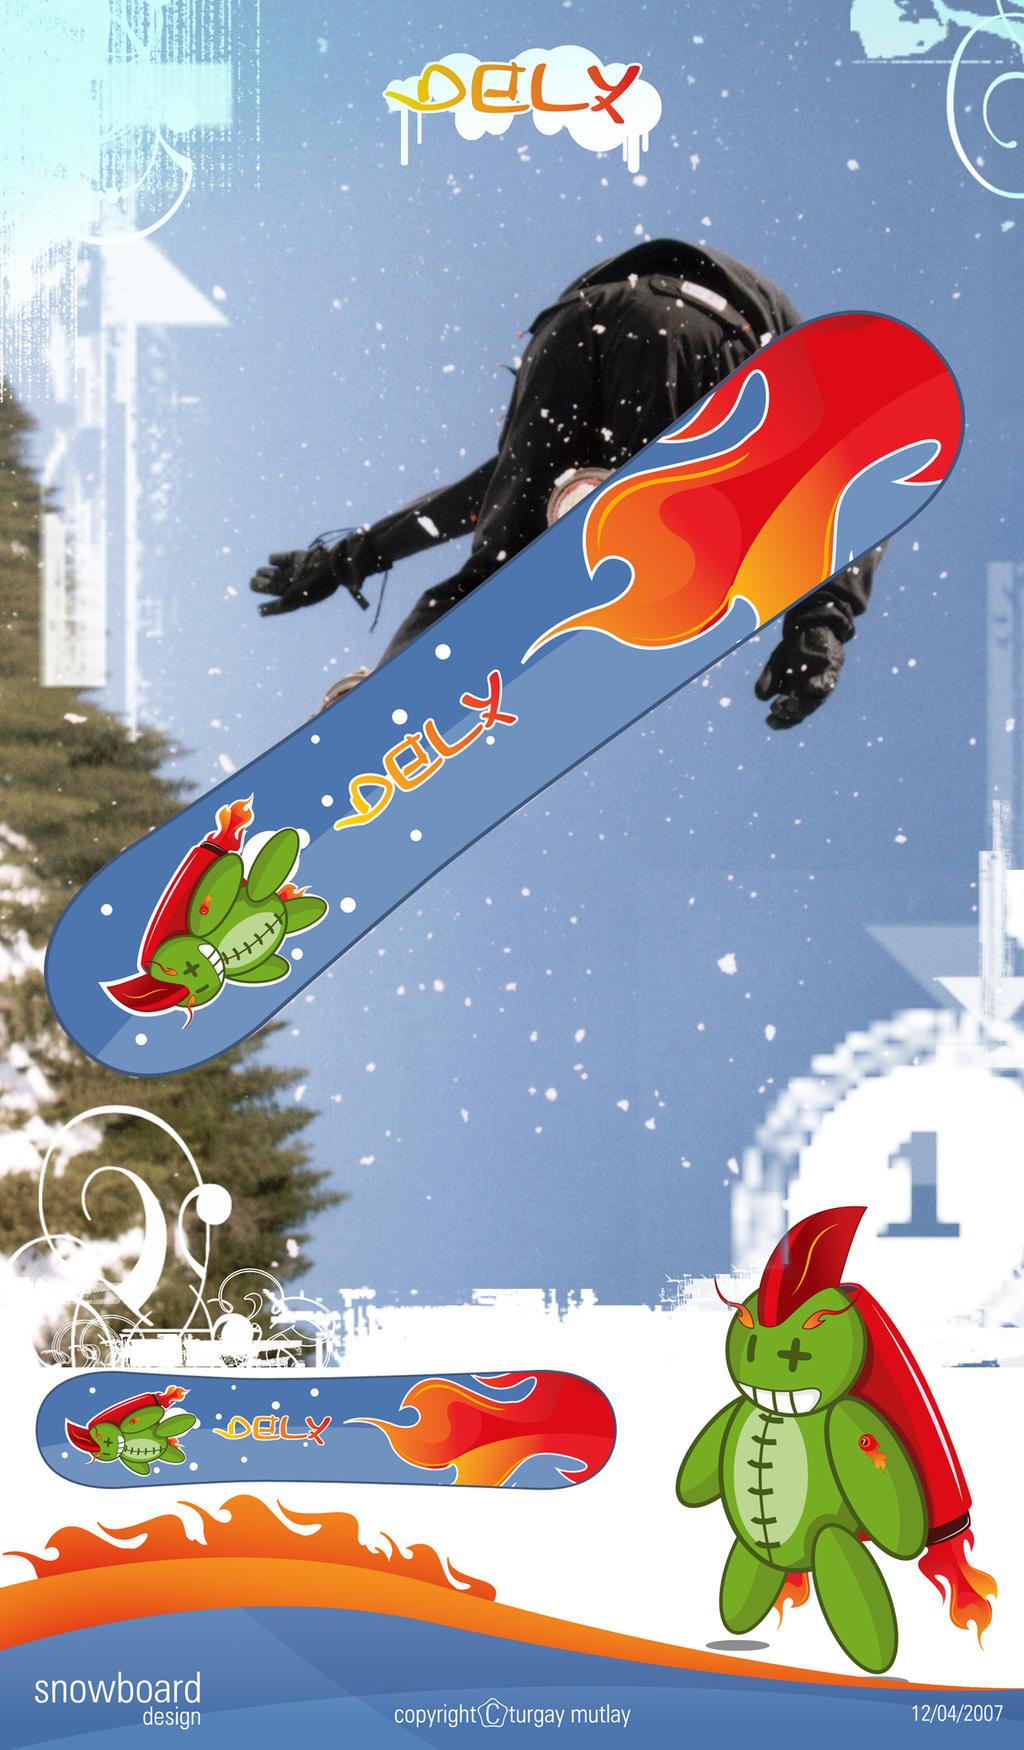 snowboard design-2 by operadevil69